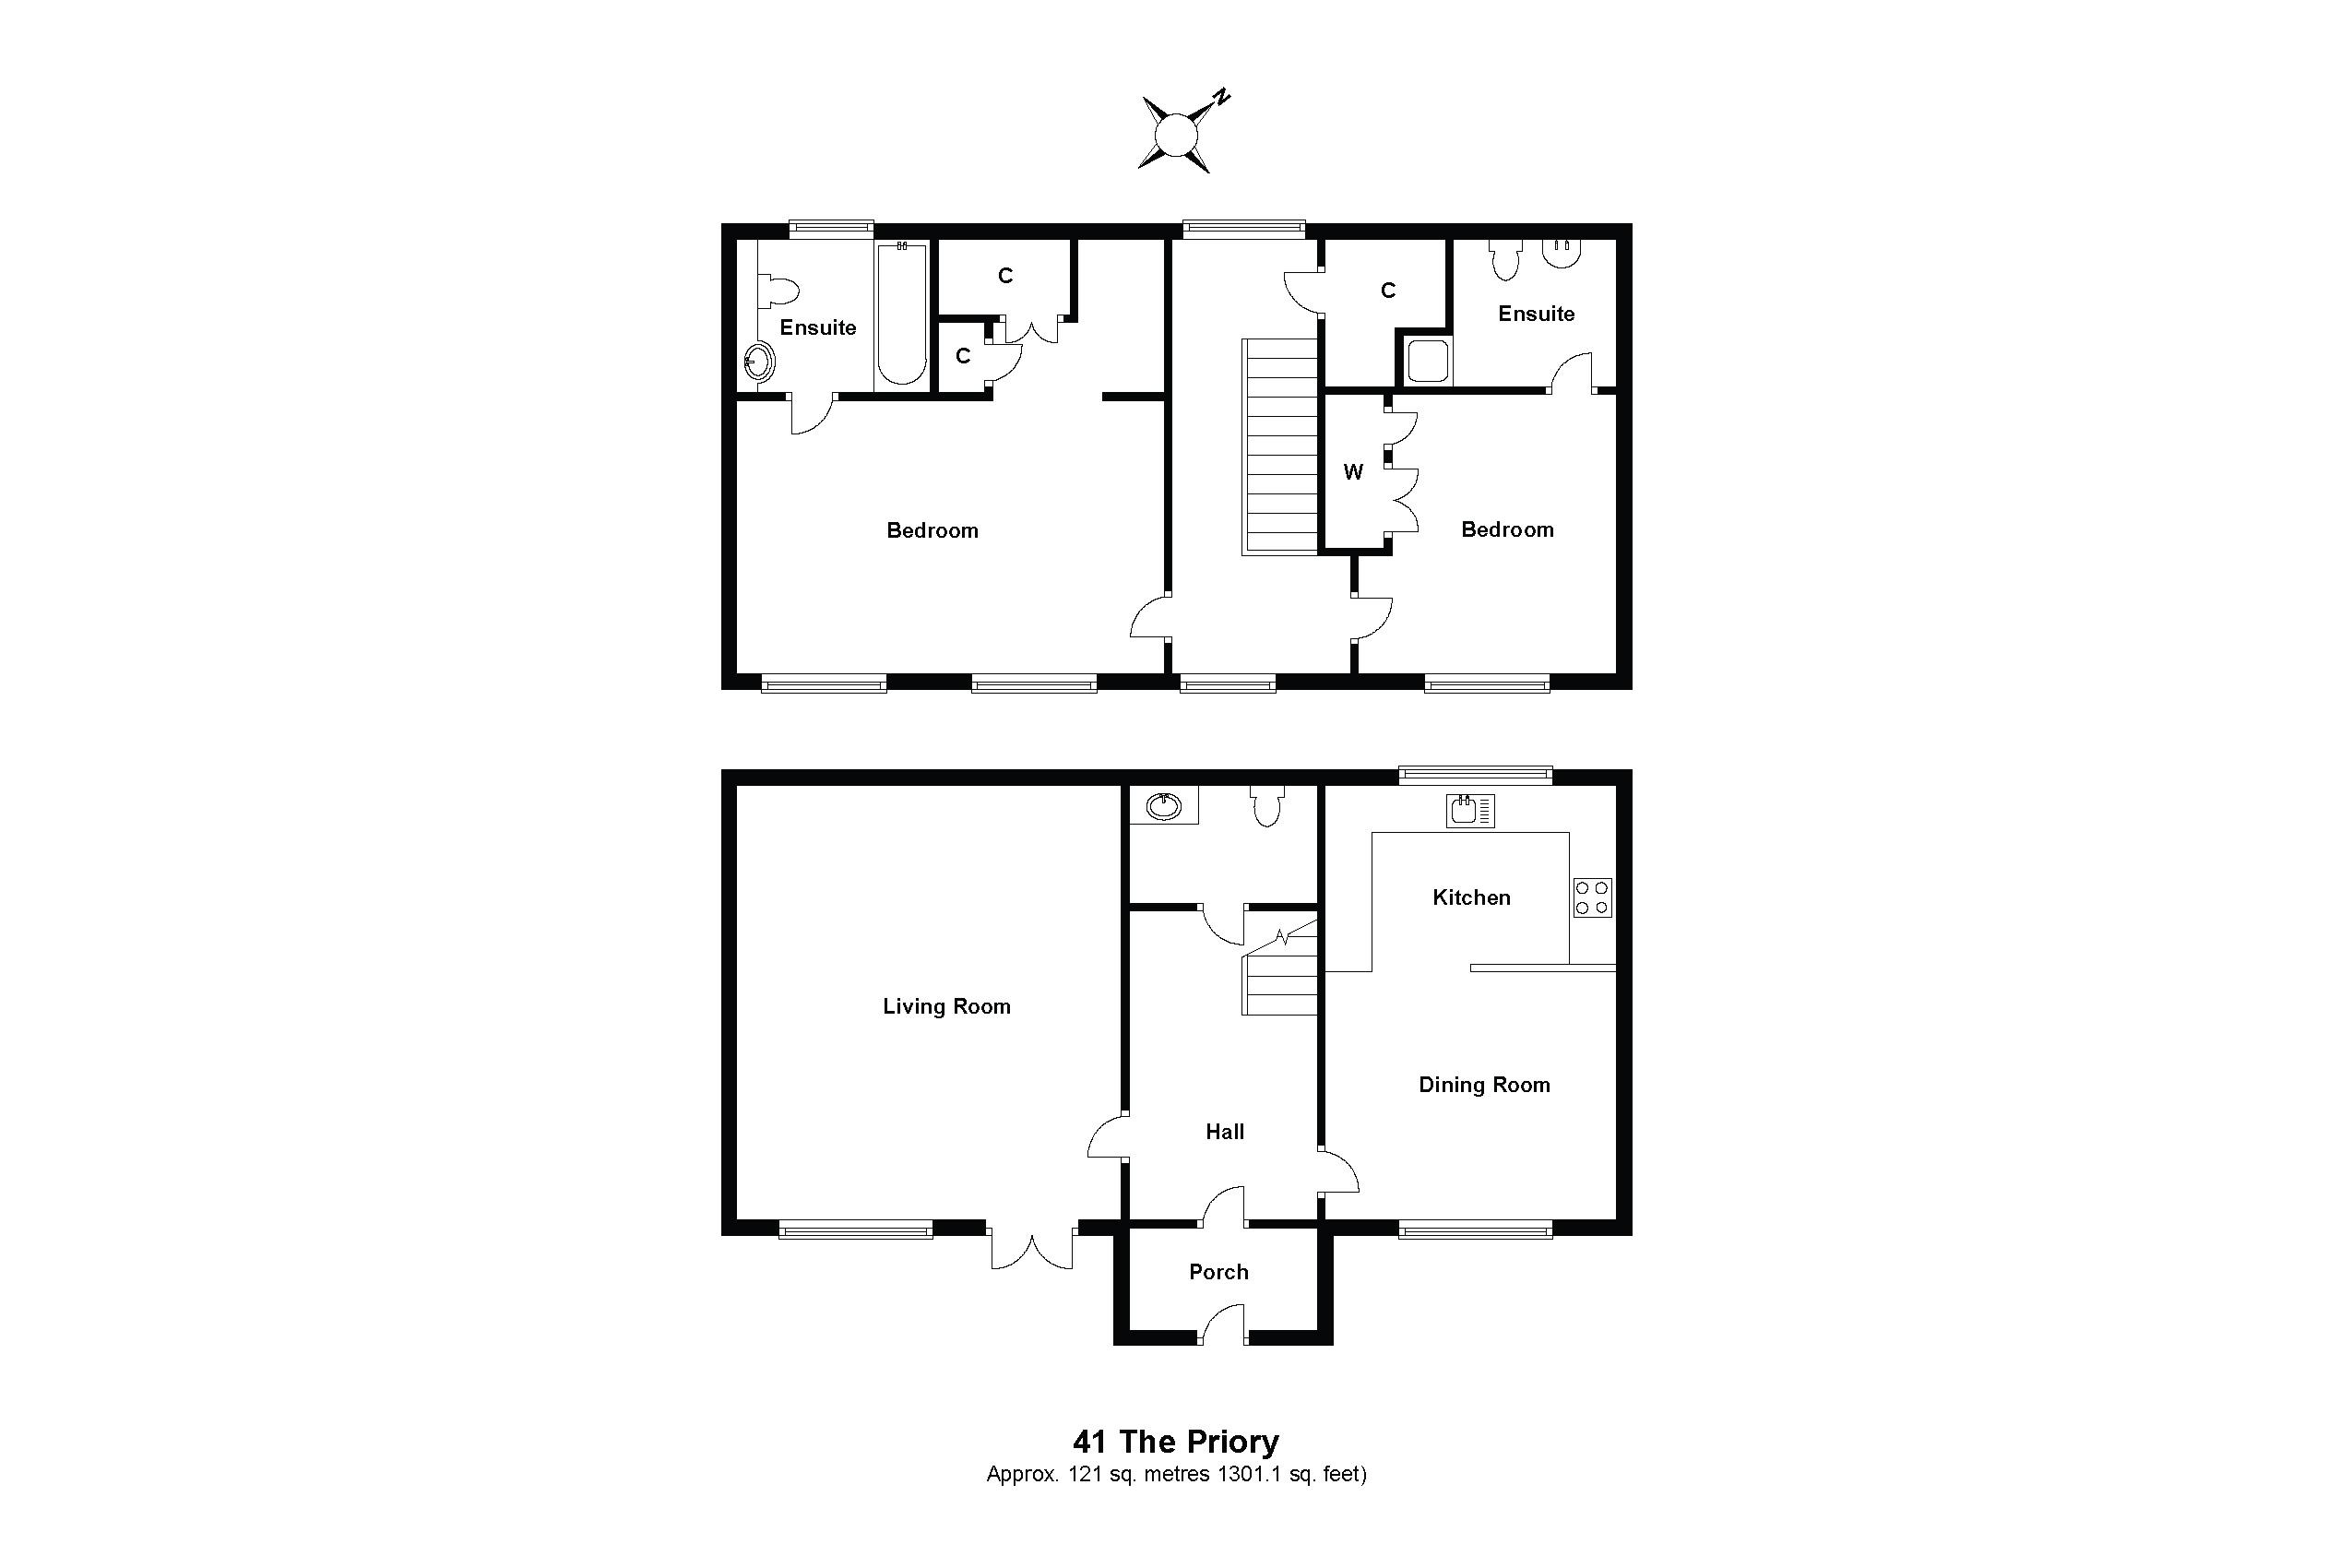 41 The Priory Floorplan